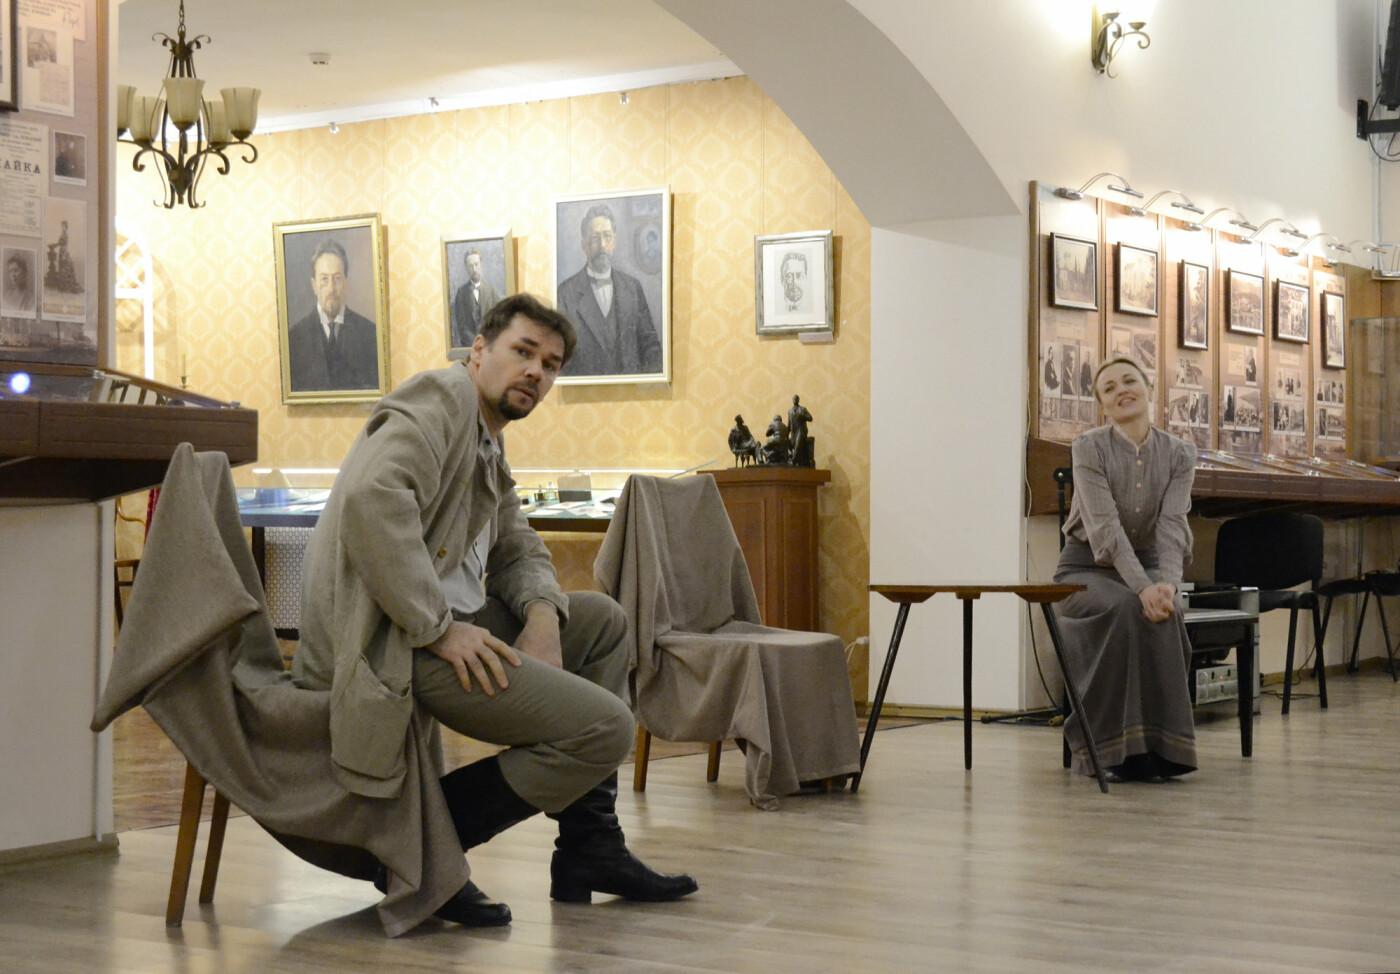 Как Ялта отметила 160 лет со дня рождения Антона Павловича Чехова, фото-4